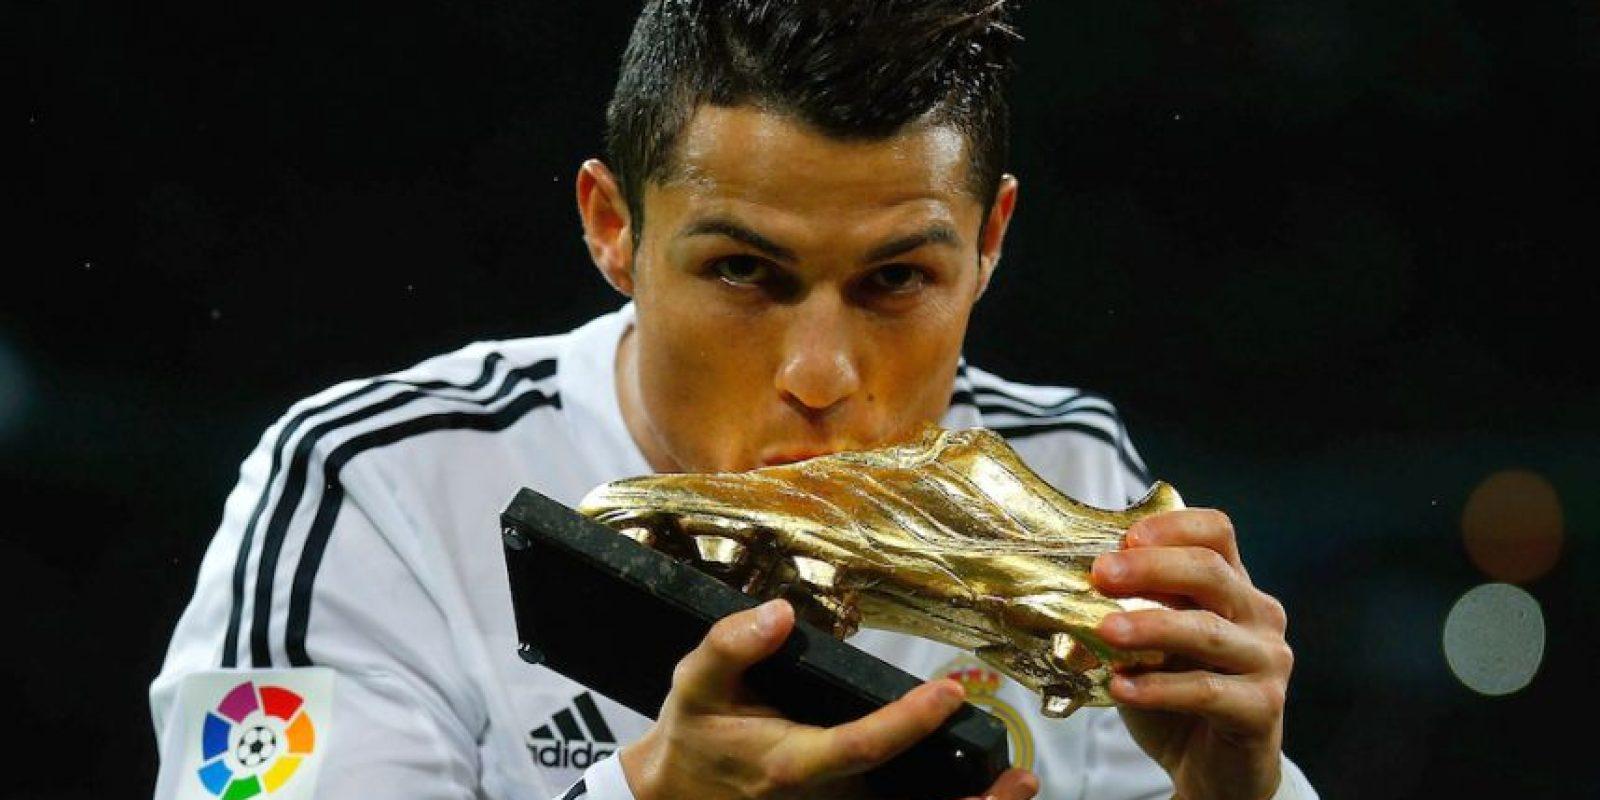 Cristiano hizo 31 goles en 62 partidos. Foto:Getty Images